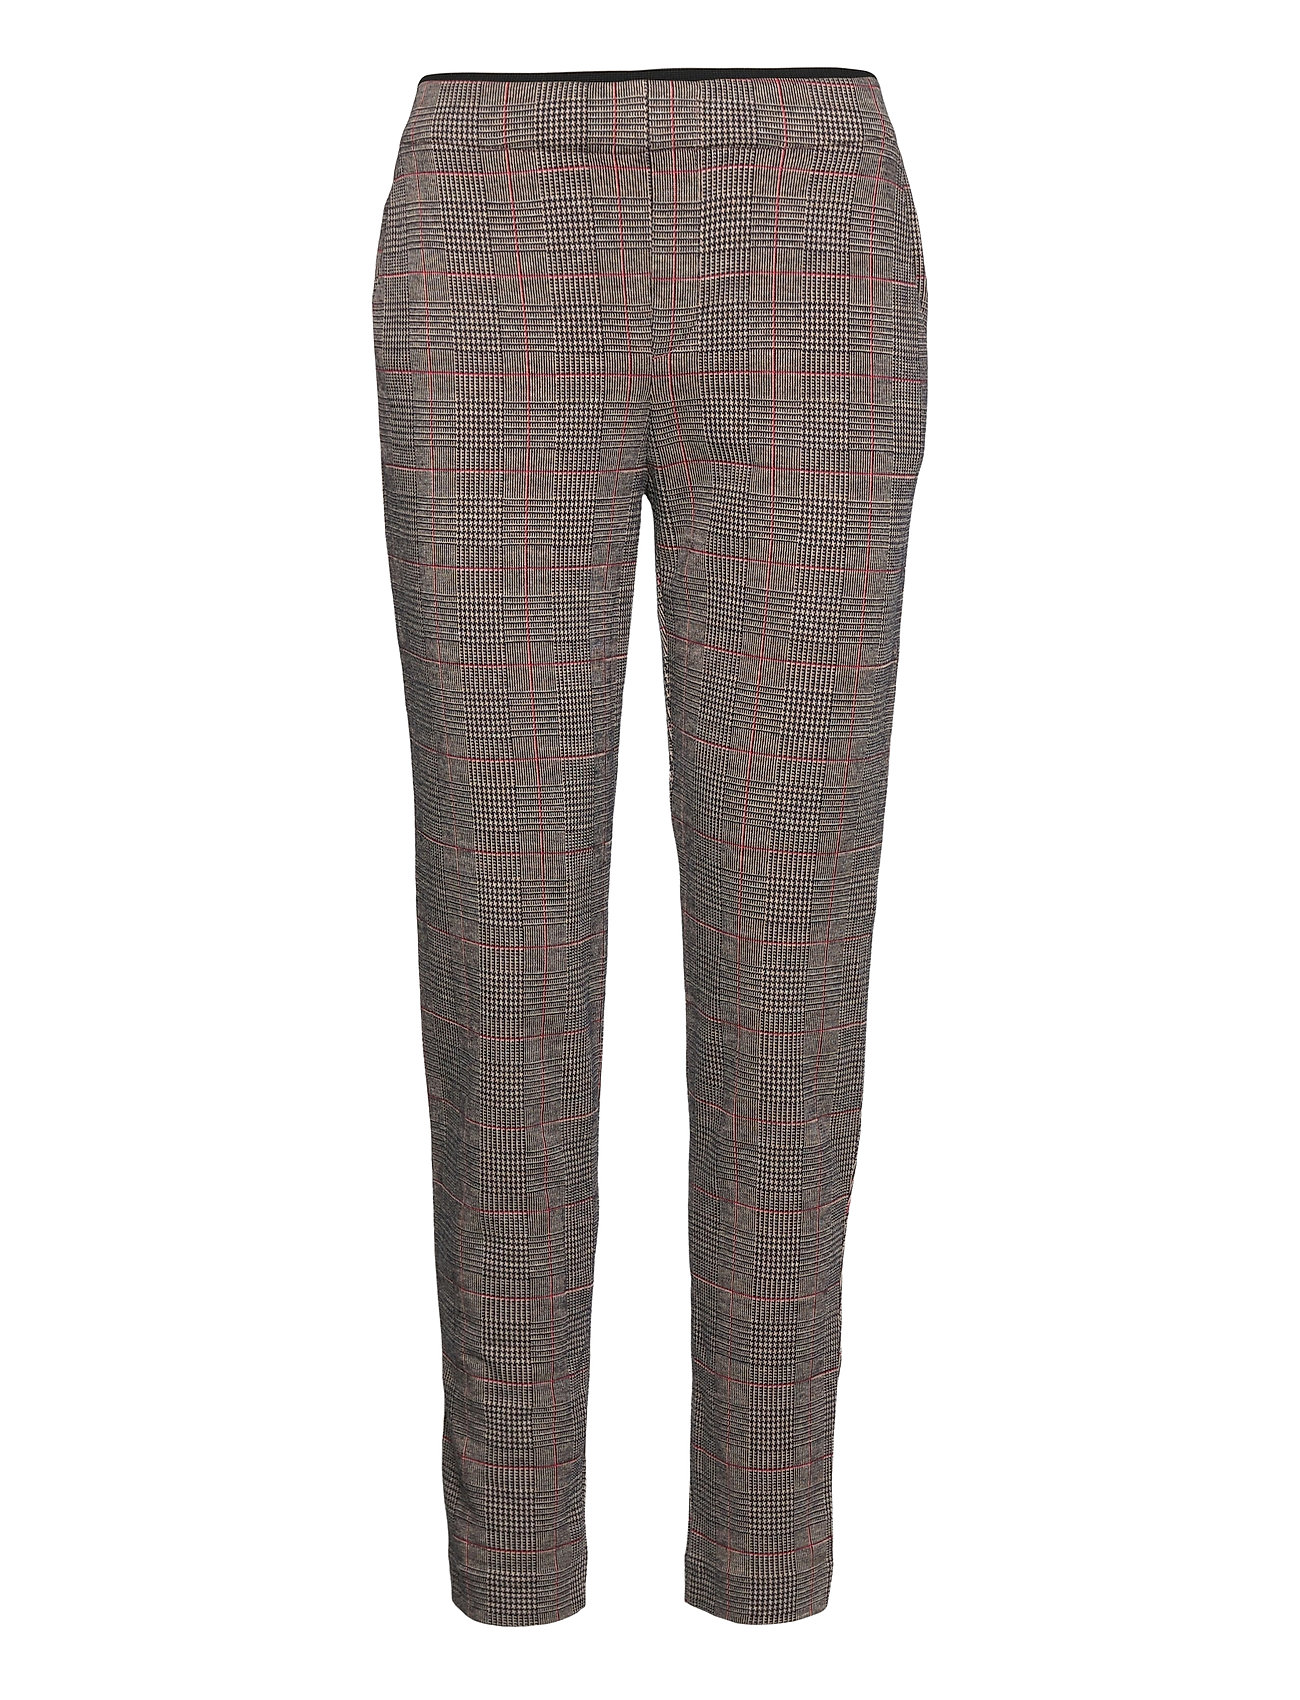 Image of Pants Woven Casual Bukser Brun Esprit Casual (3456630291)